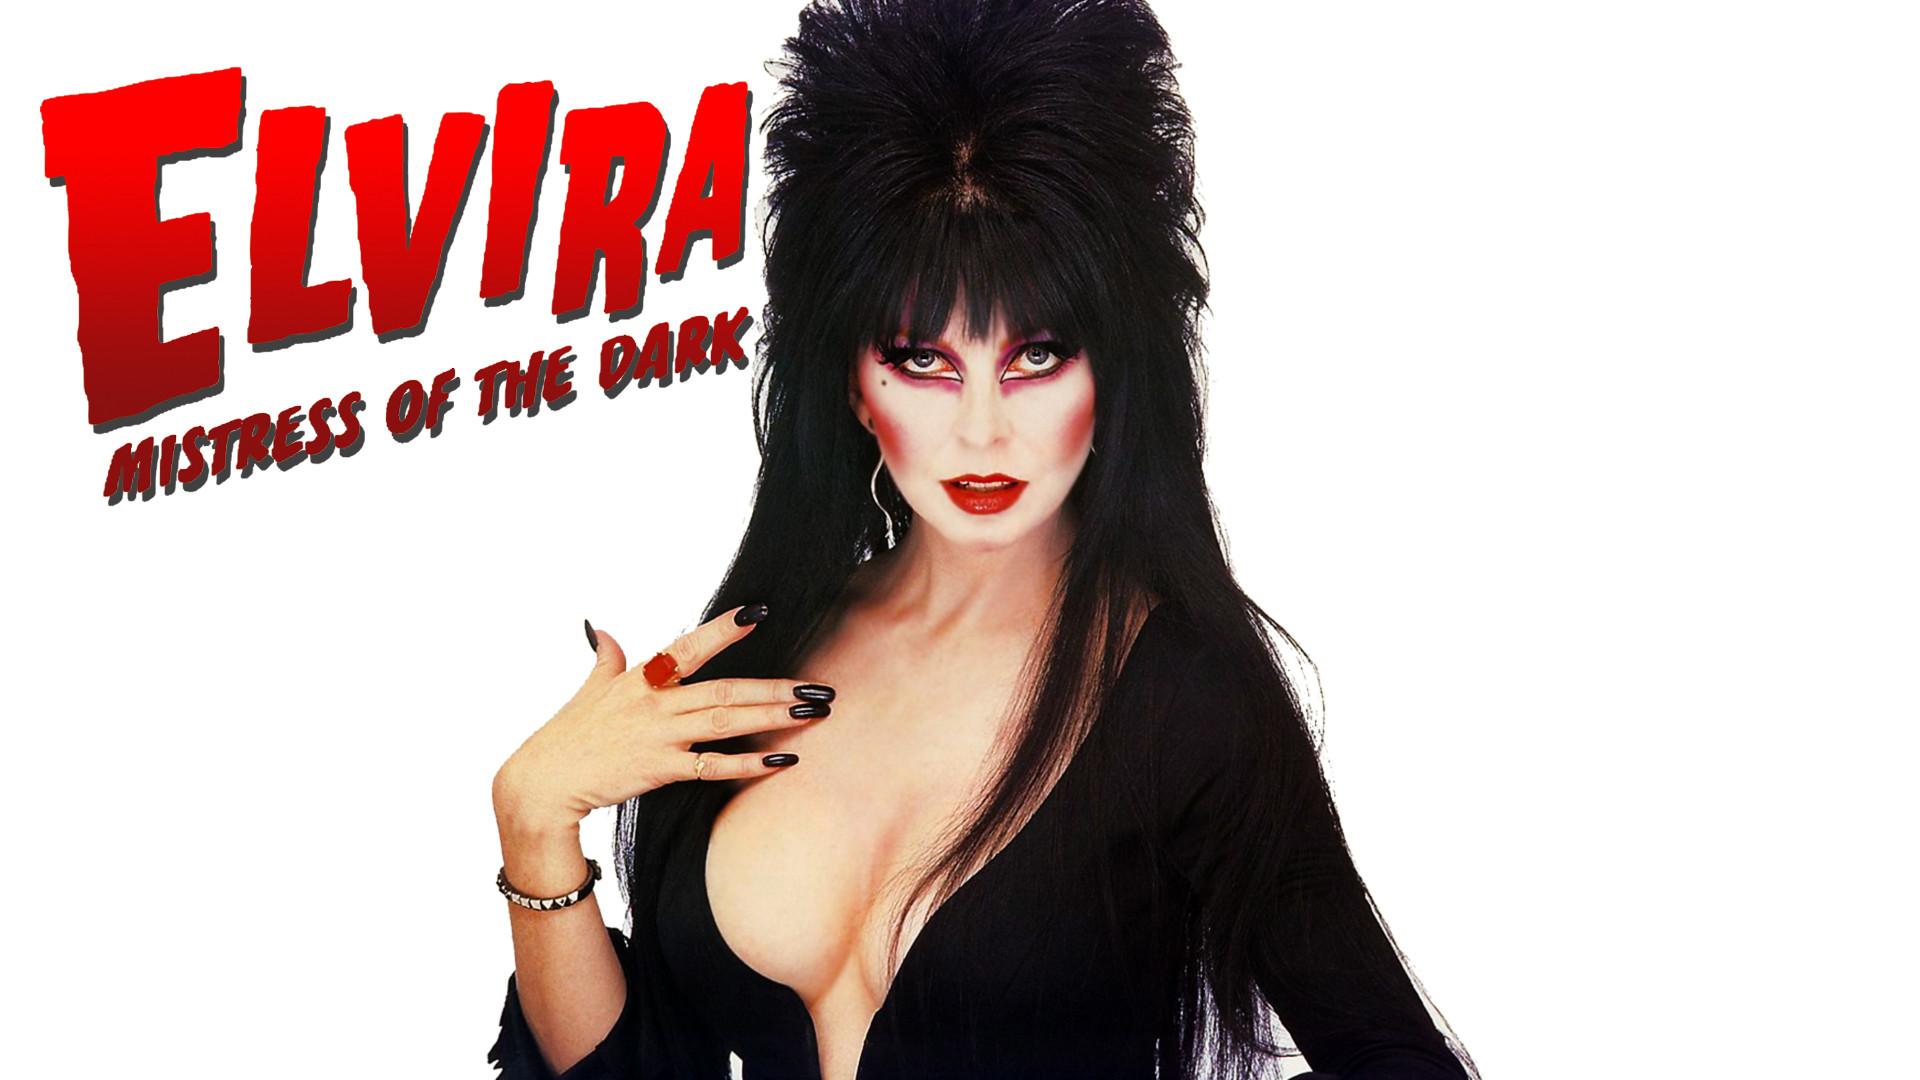 8 Fanarts / Wallpapers. Elvira, Mistress of the Dark